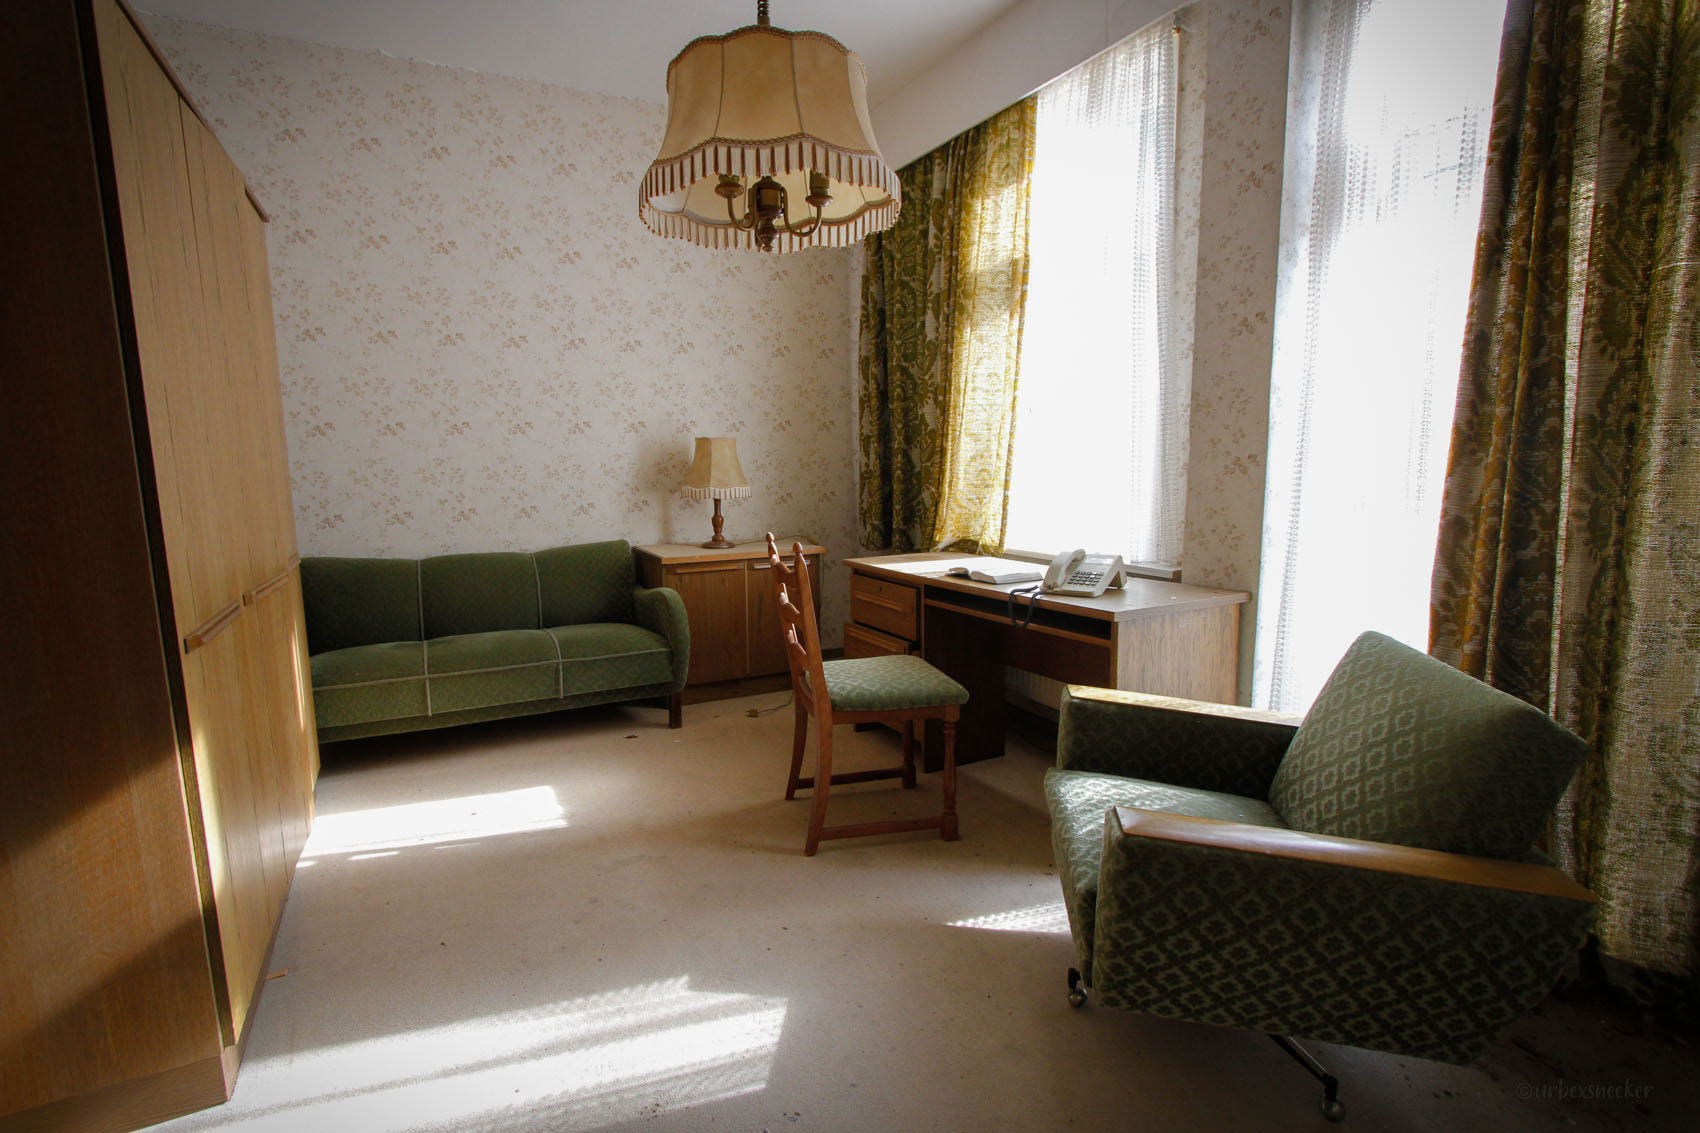 hotel tedy grüner raum